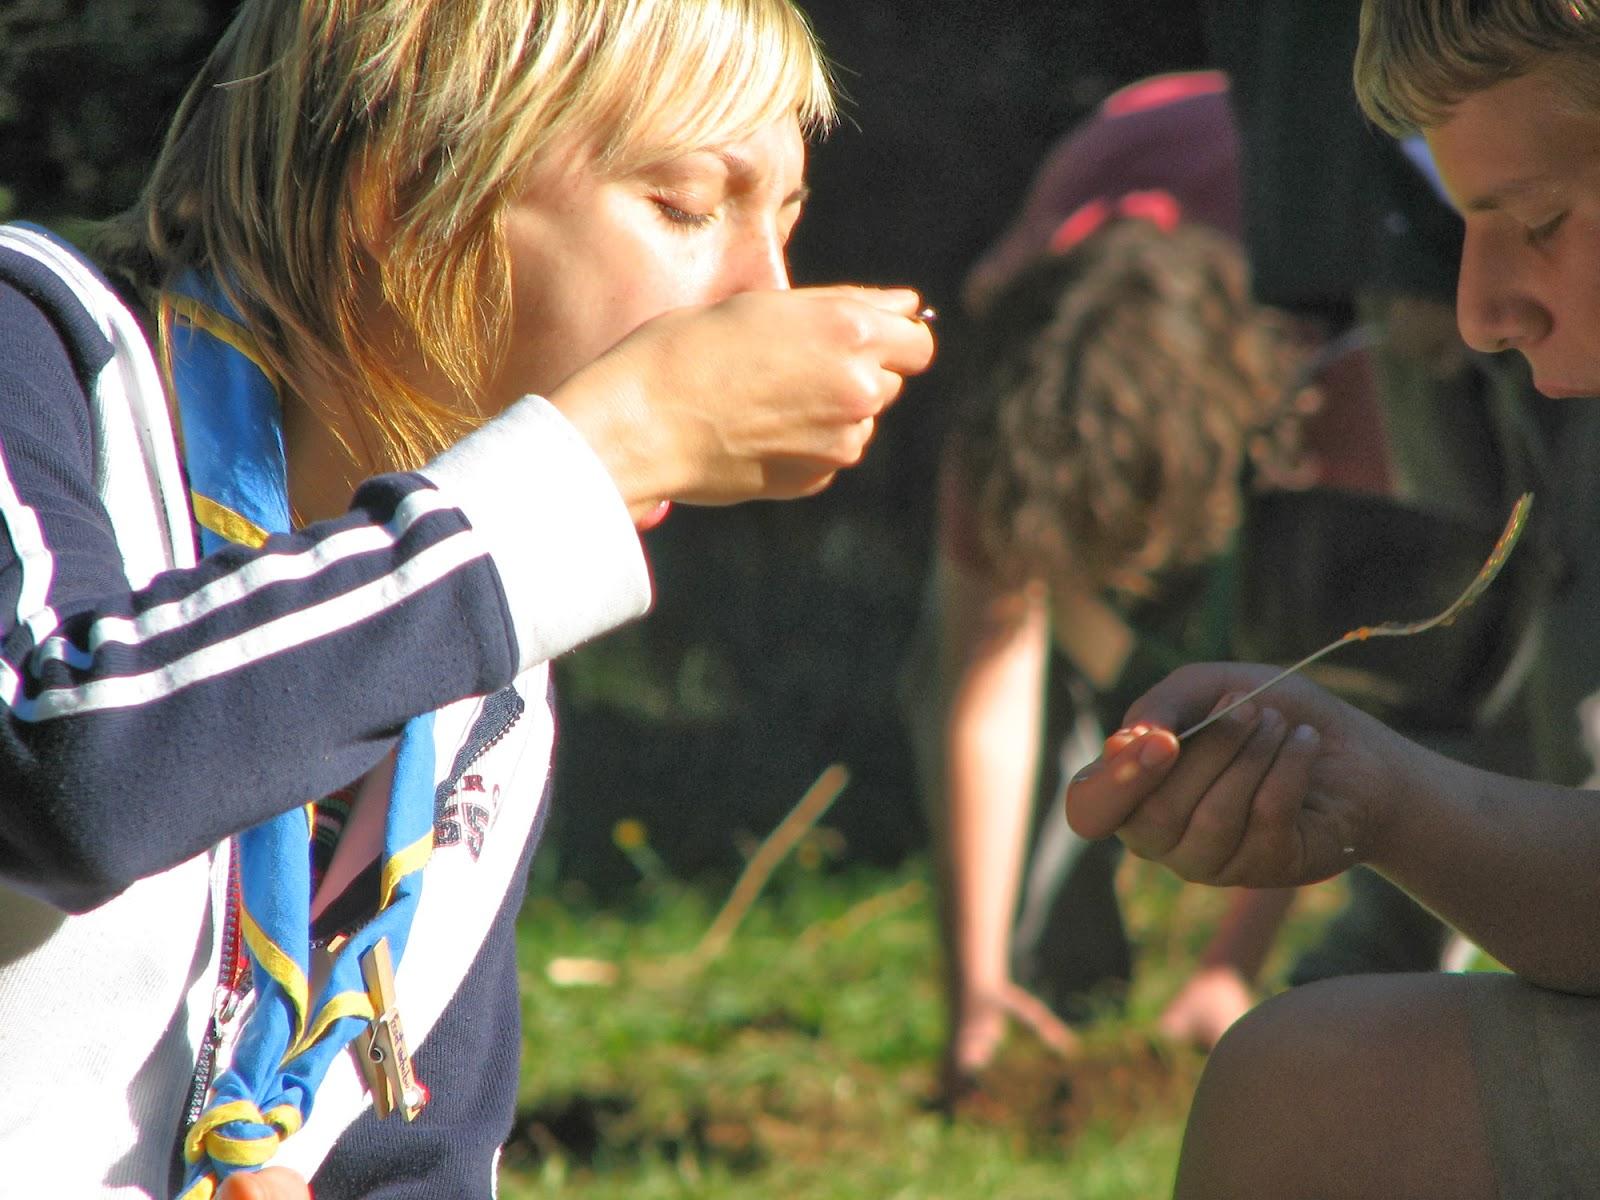 Vodov izlet, Ilirska Bistrica 2005 - Picture%2B211.jpg